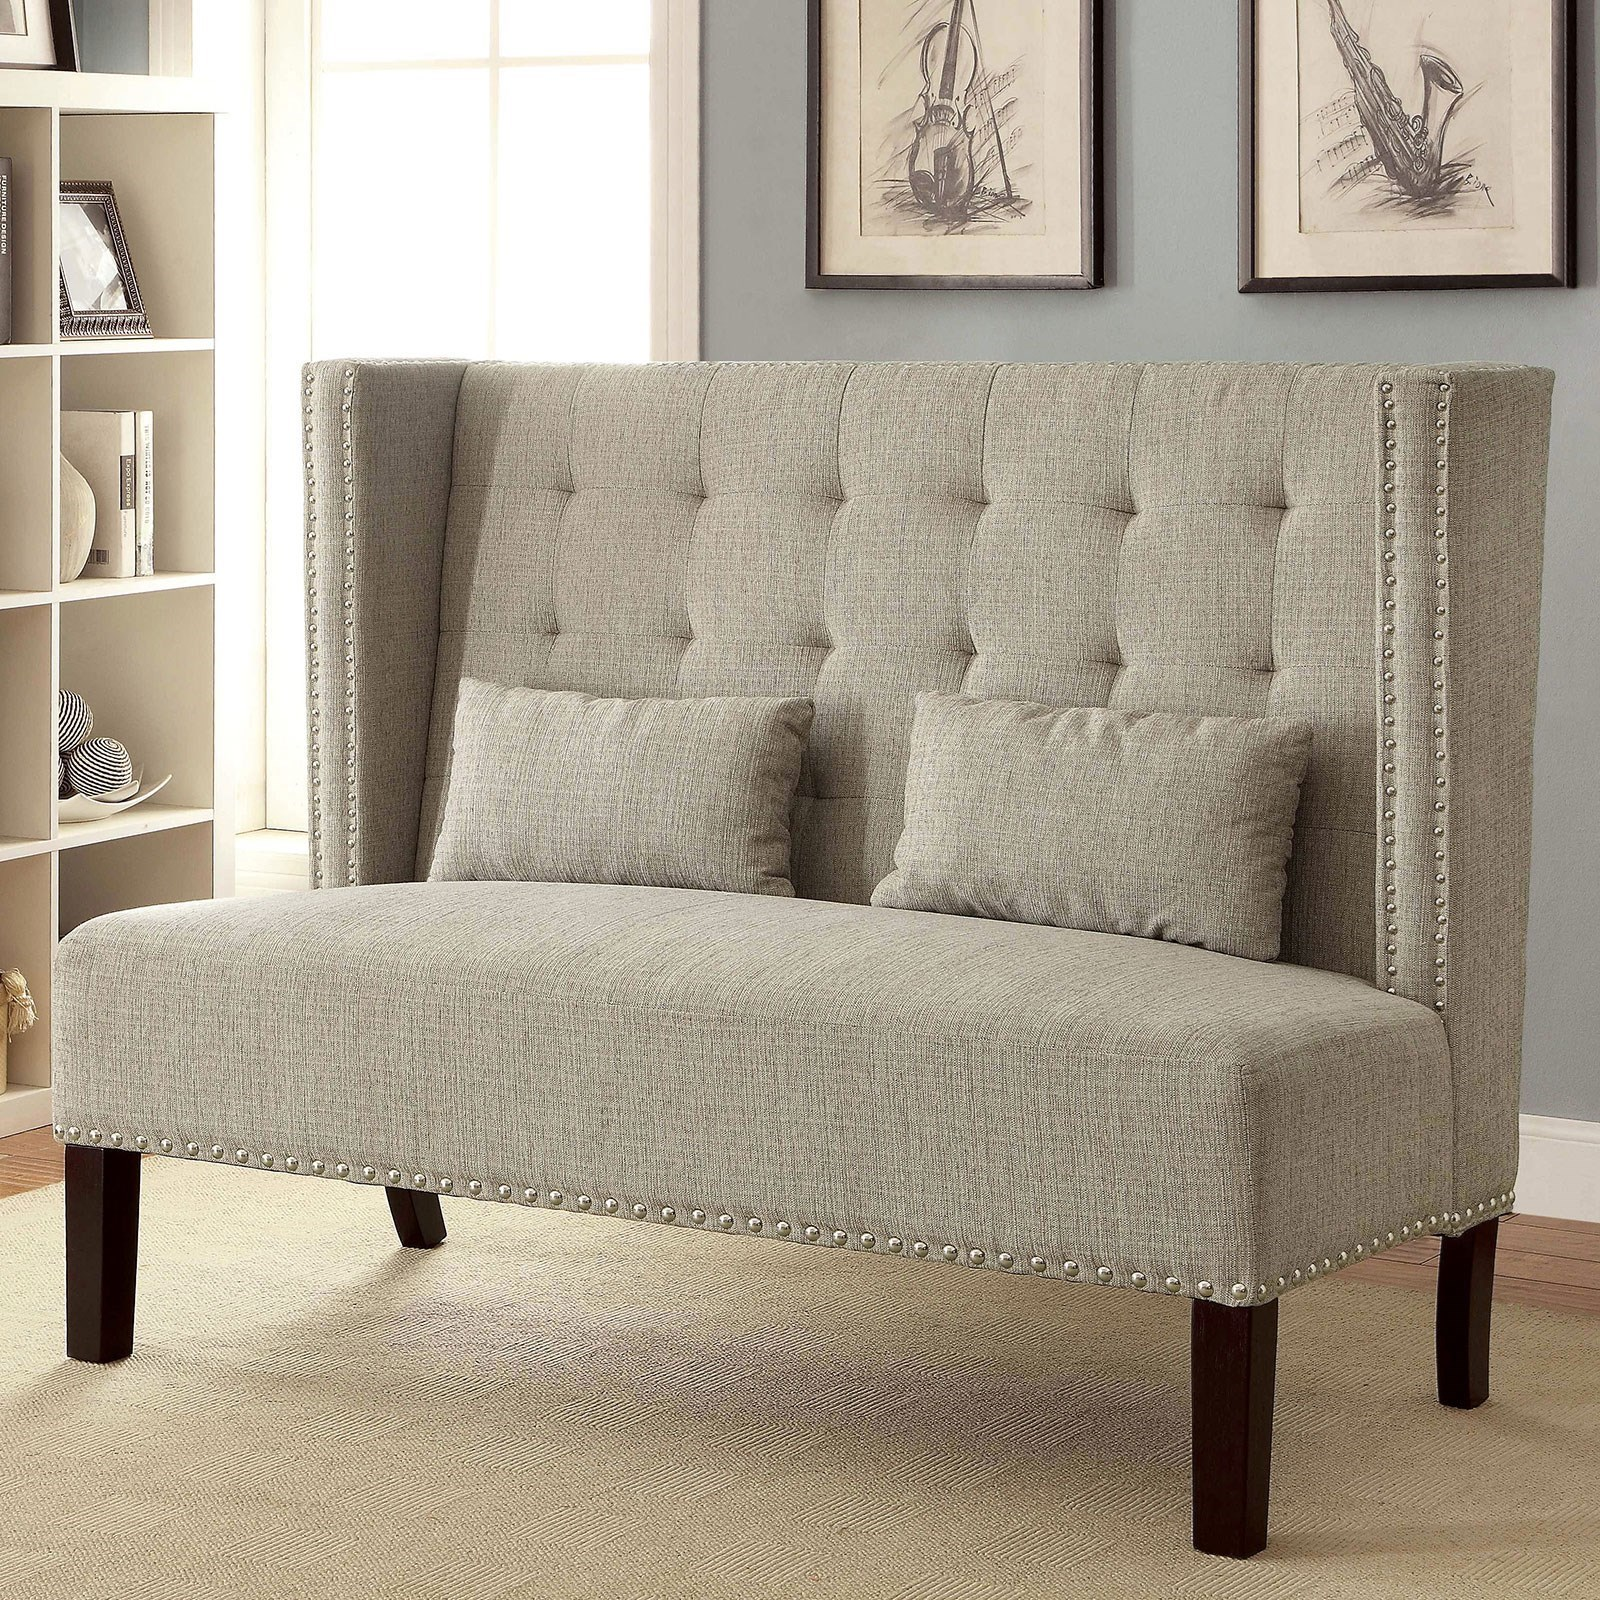 Amora Loveseat w/ Pillows at Household Furniture